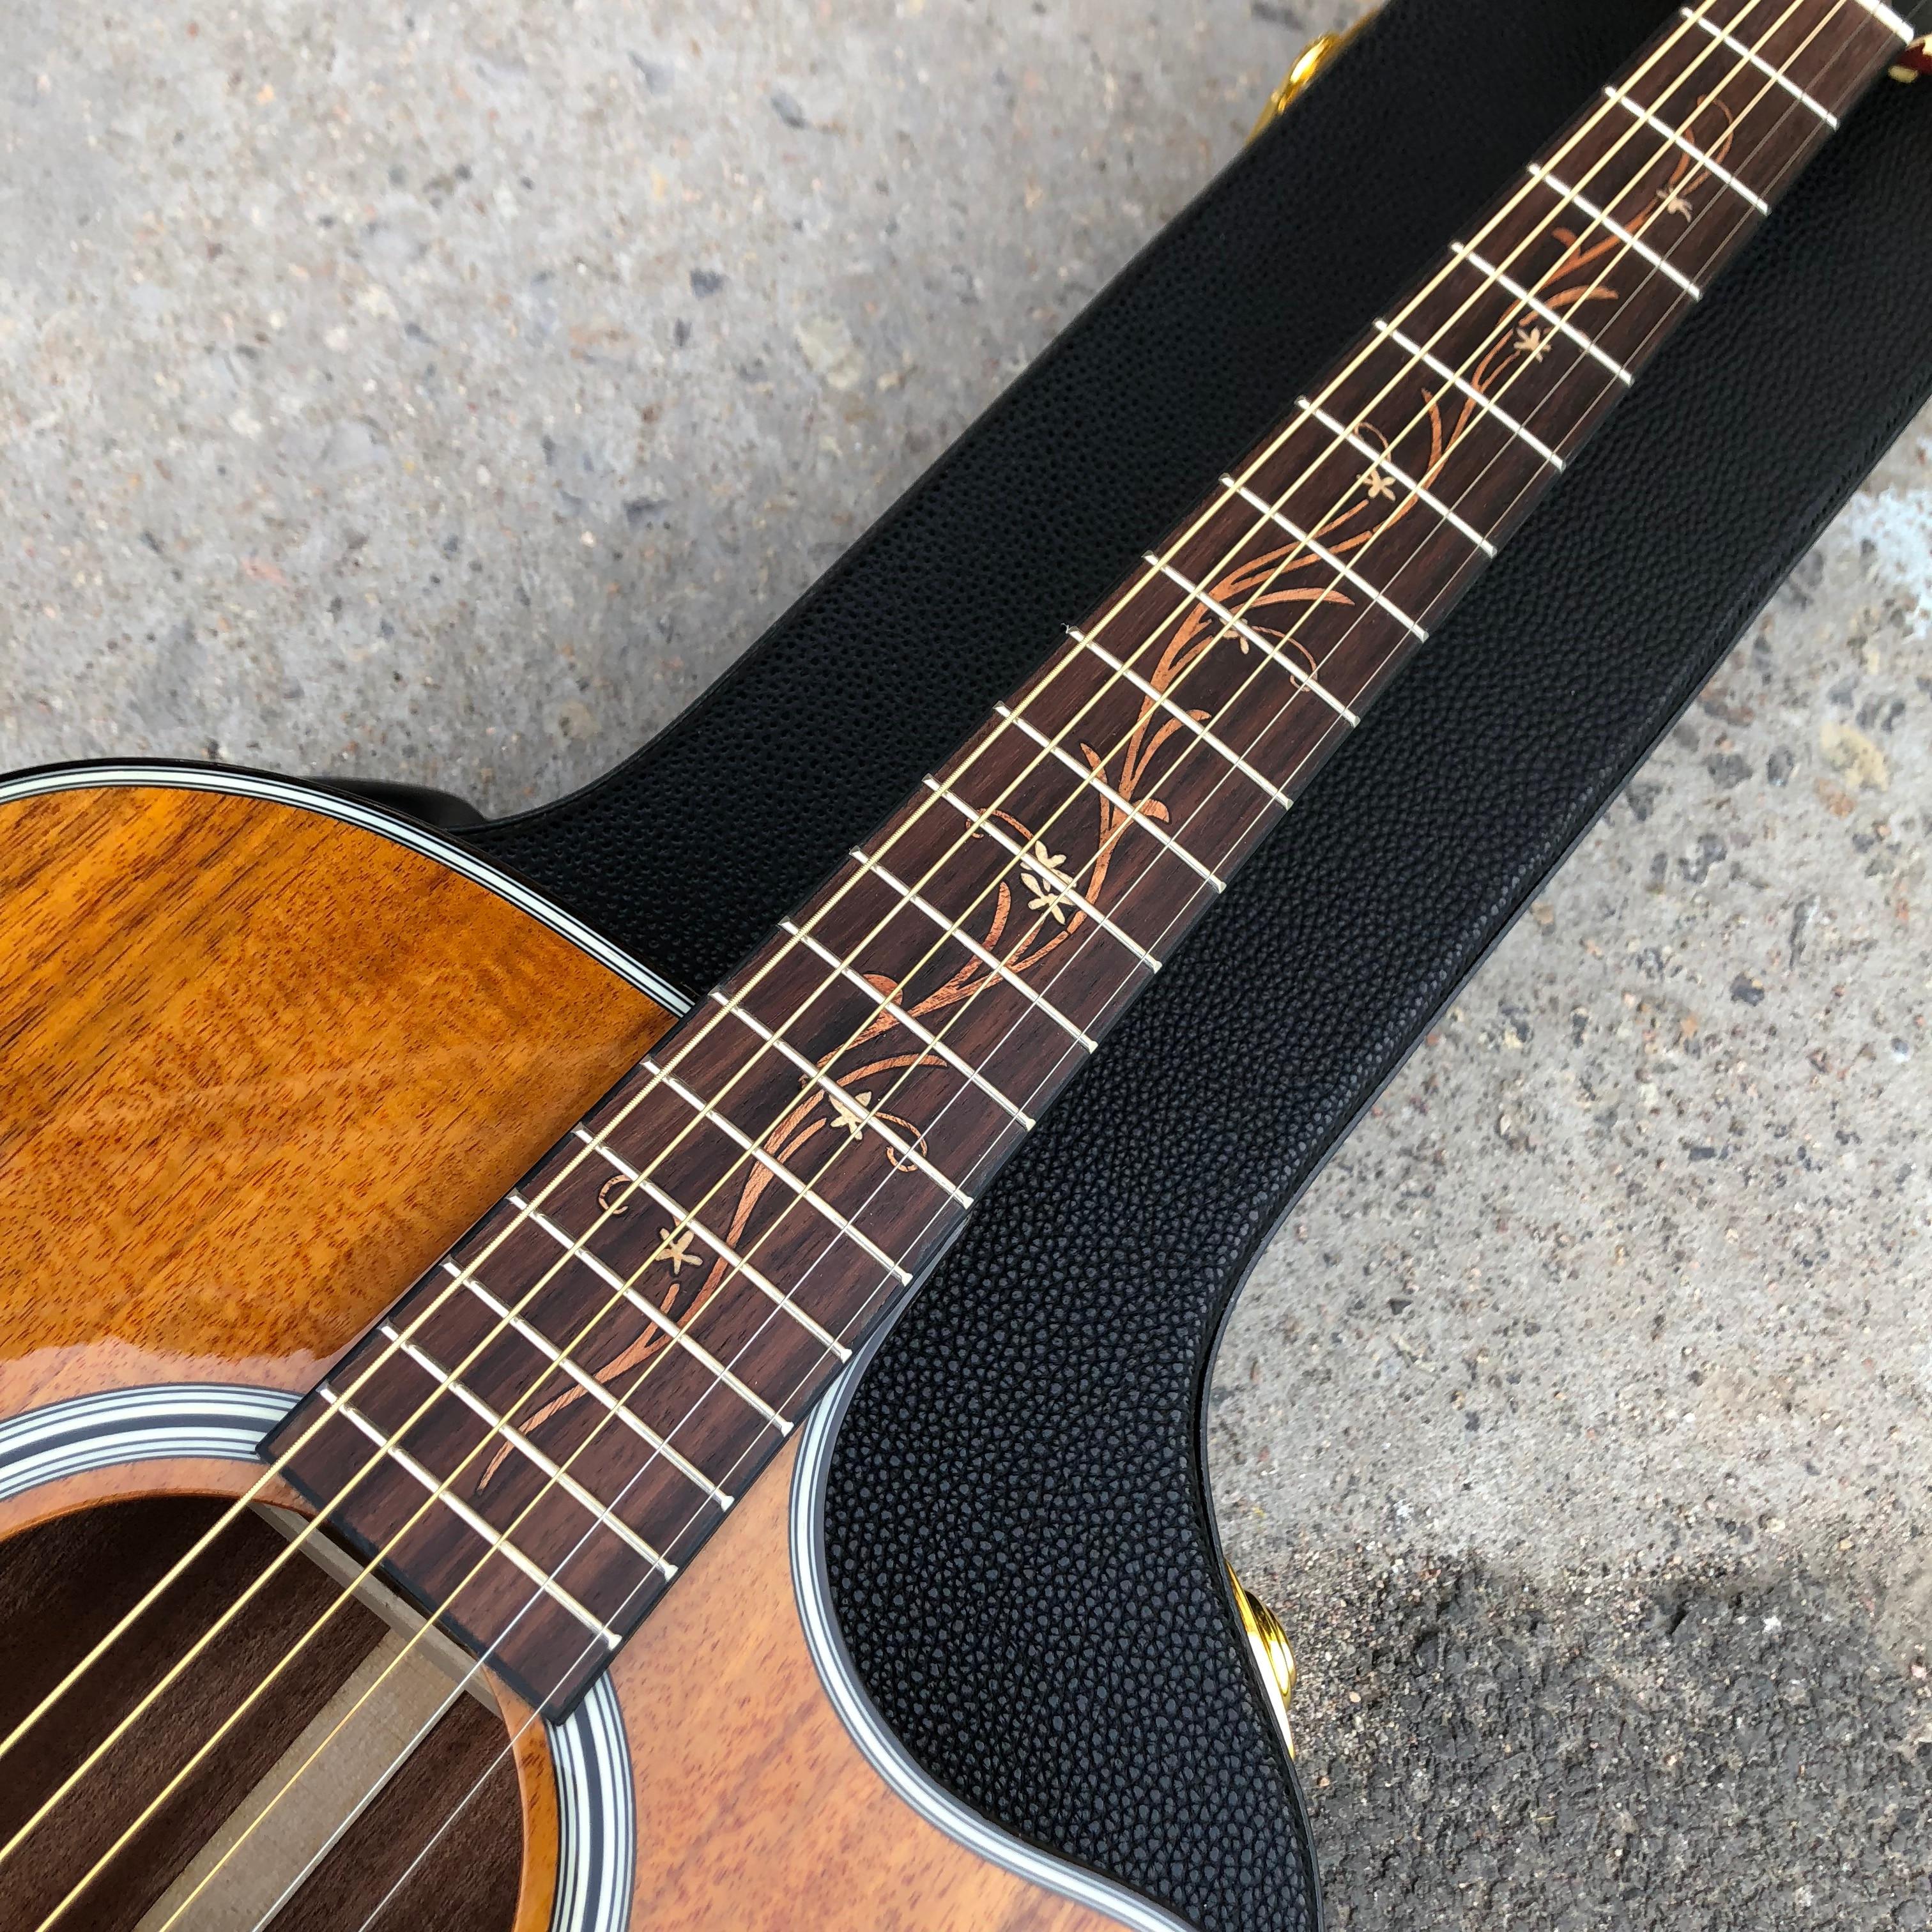 Rosewood Fingerboard 41 Inch Koa wood K24ce Acoustic Guitar enlarge